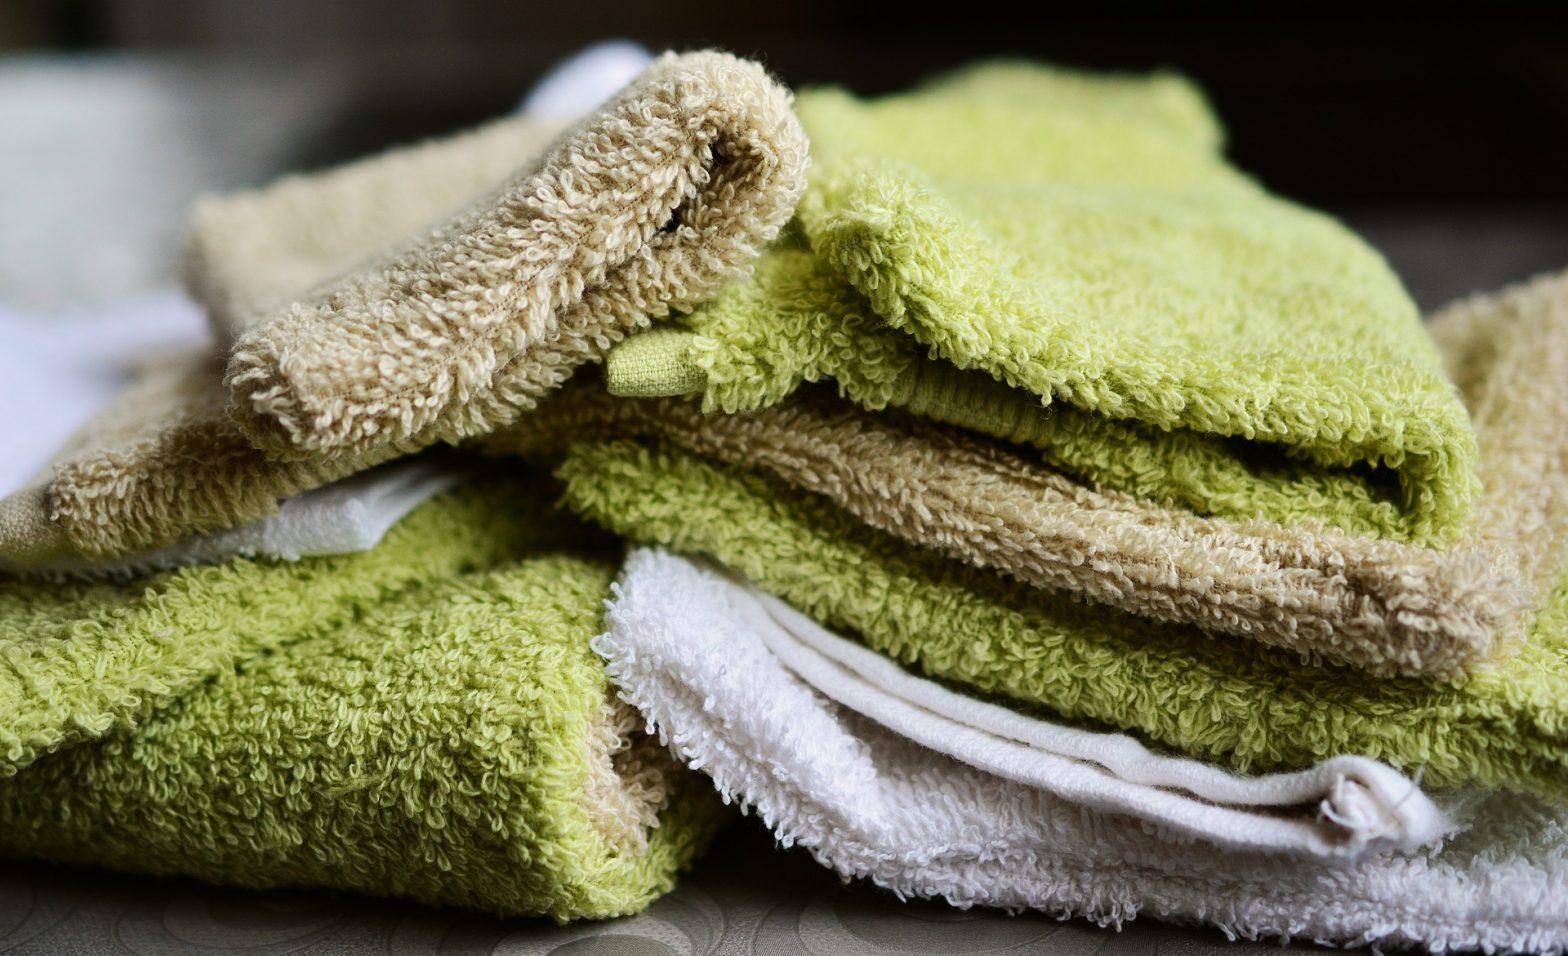 Faire sa lessive soi-même